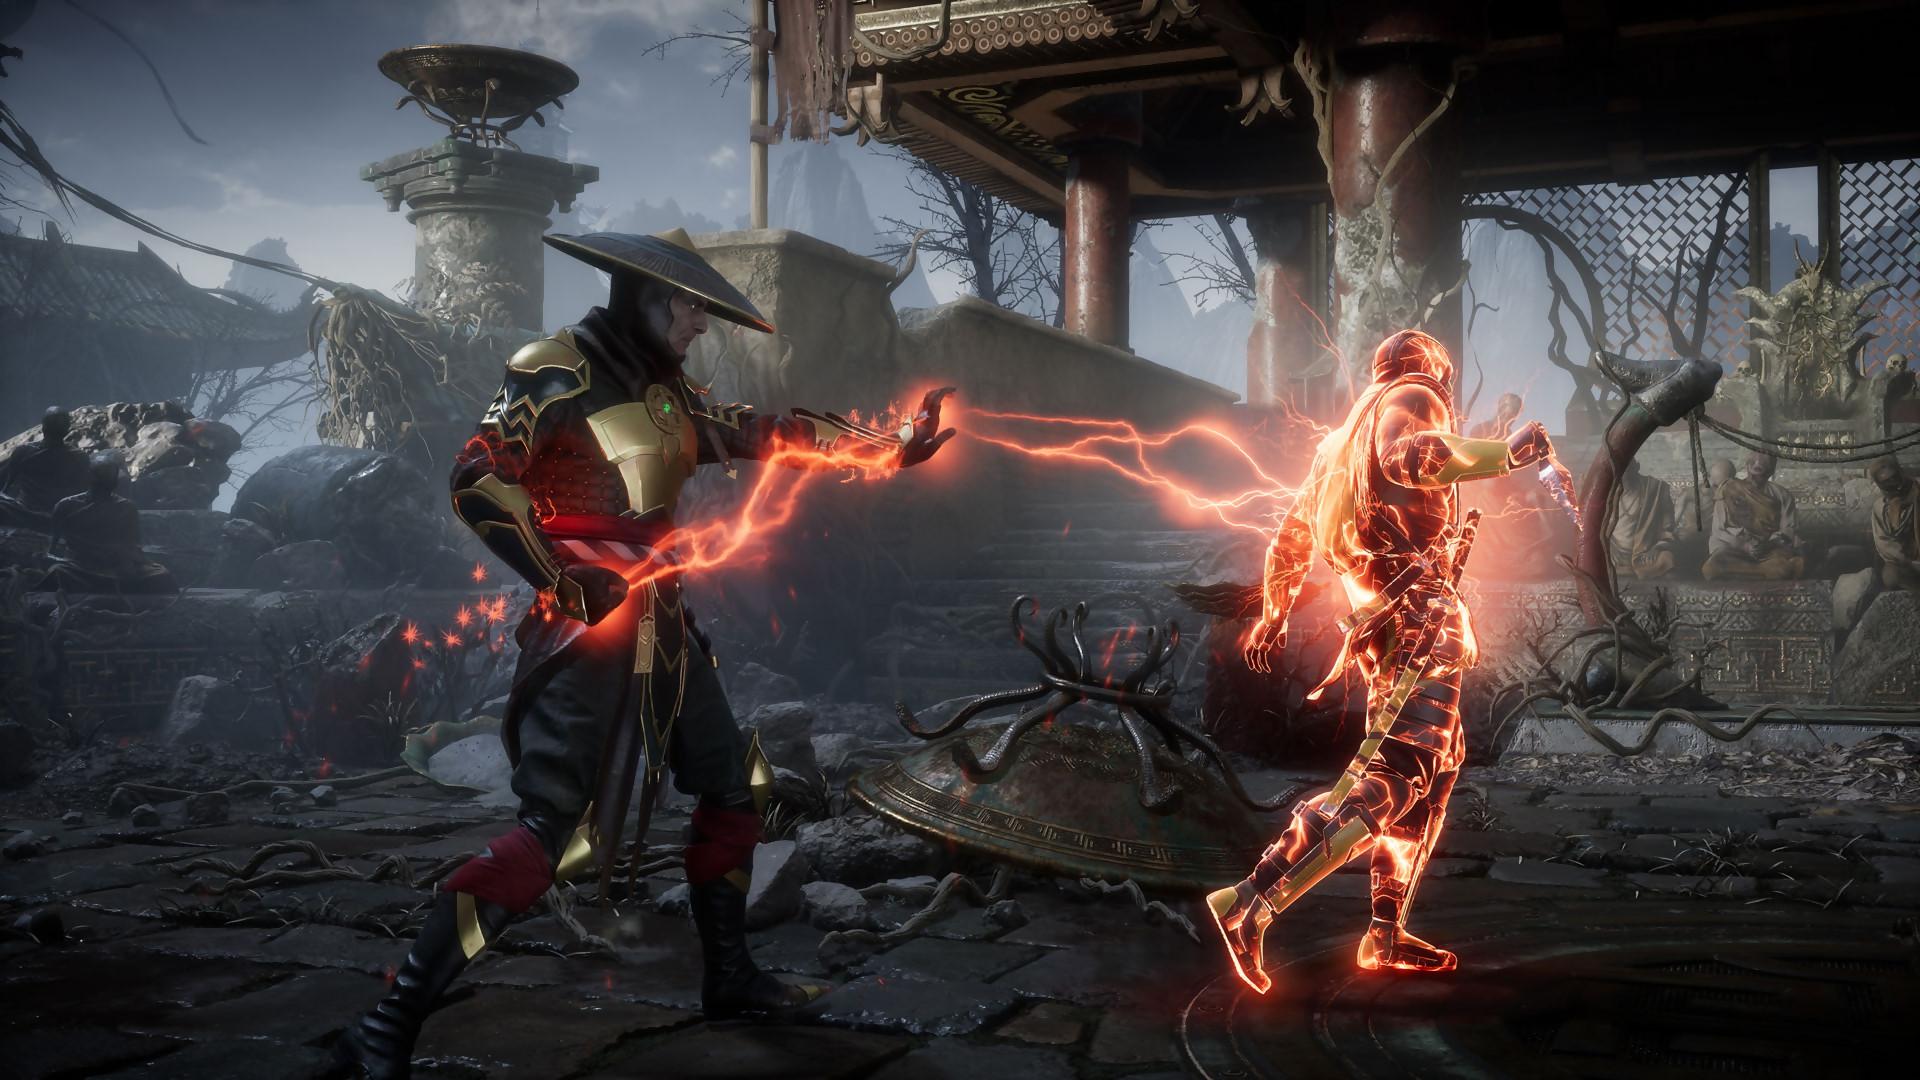 Mortal Kombat 11 : nouvelle salve de screenshots sanglants ...